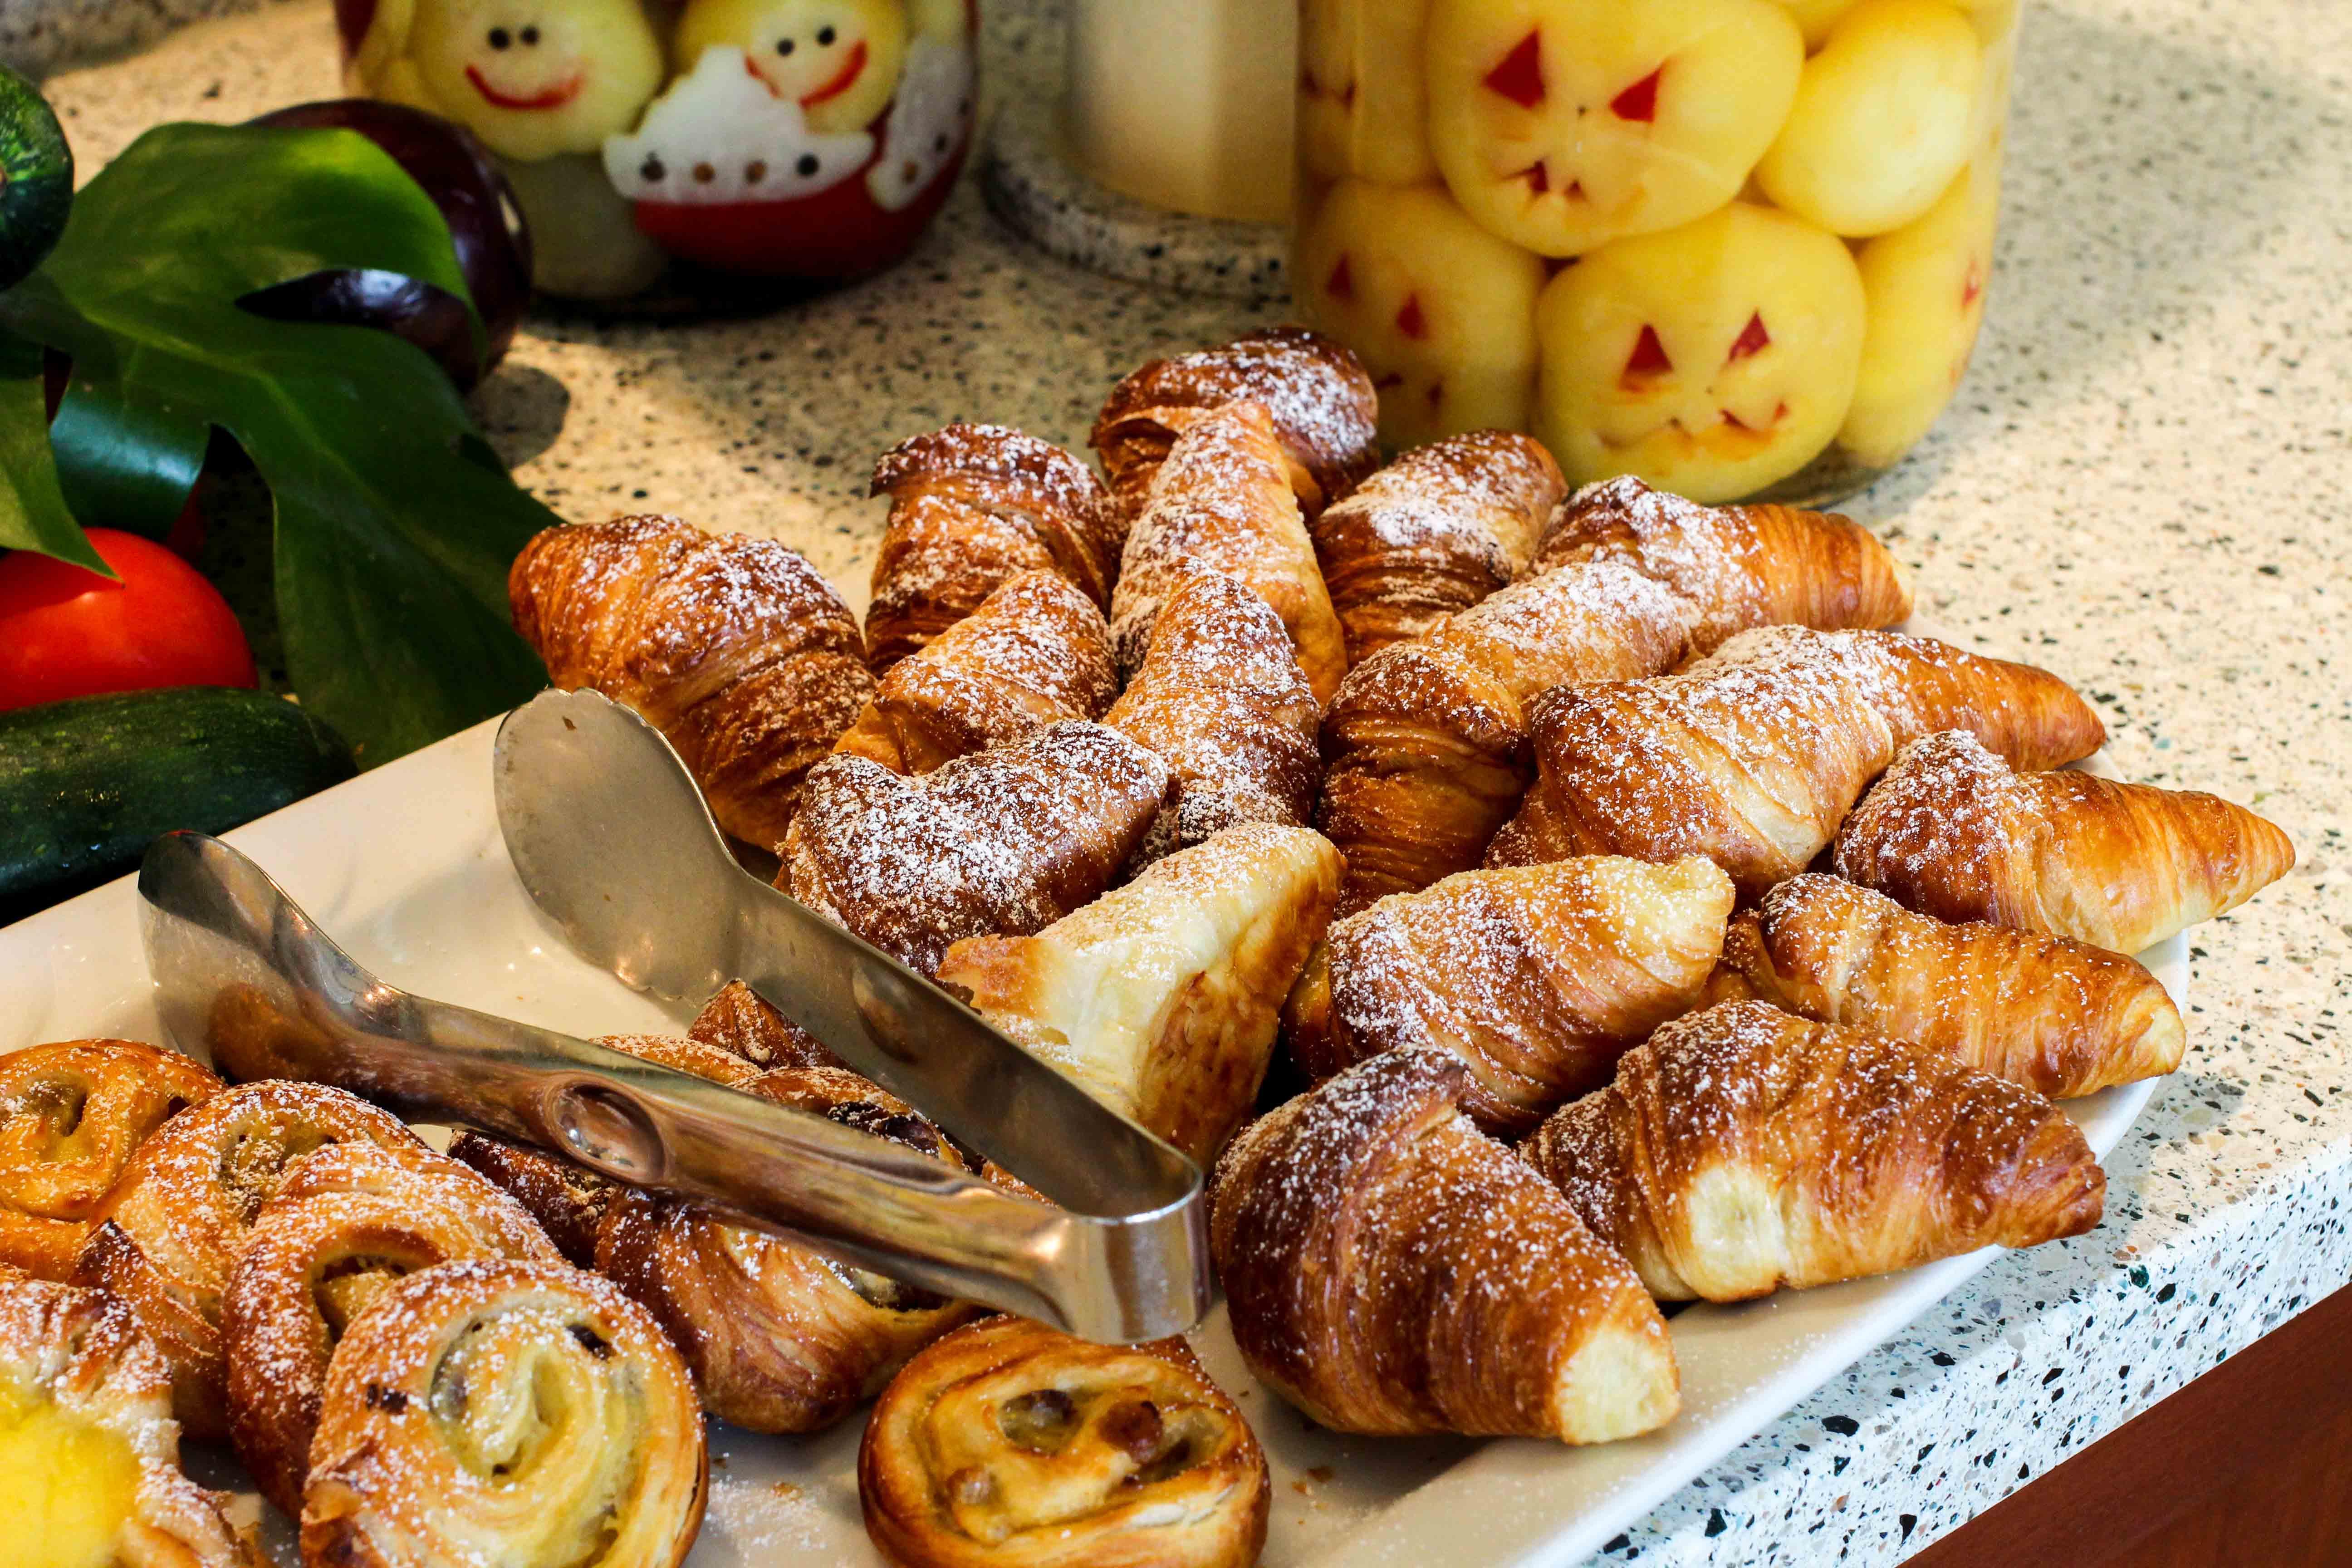 Donaukreuzfahrt A-Rosa Bella Restaurant Croissants Flusskreuzfahrt Flusskreuzfahrtschiff 7 Tage Donau Klassik Tour Arosa Reiseblogger